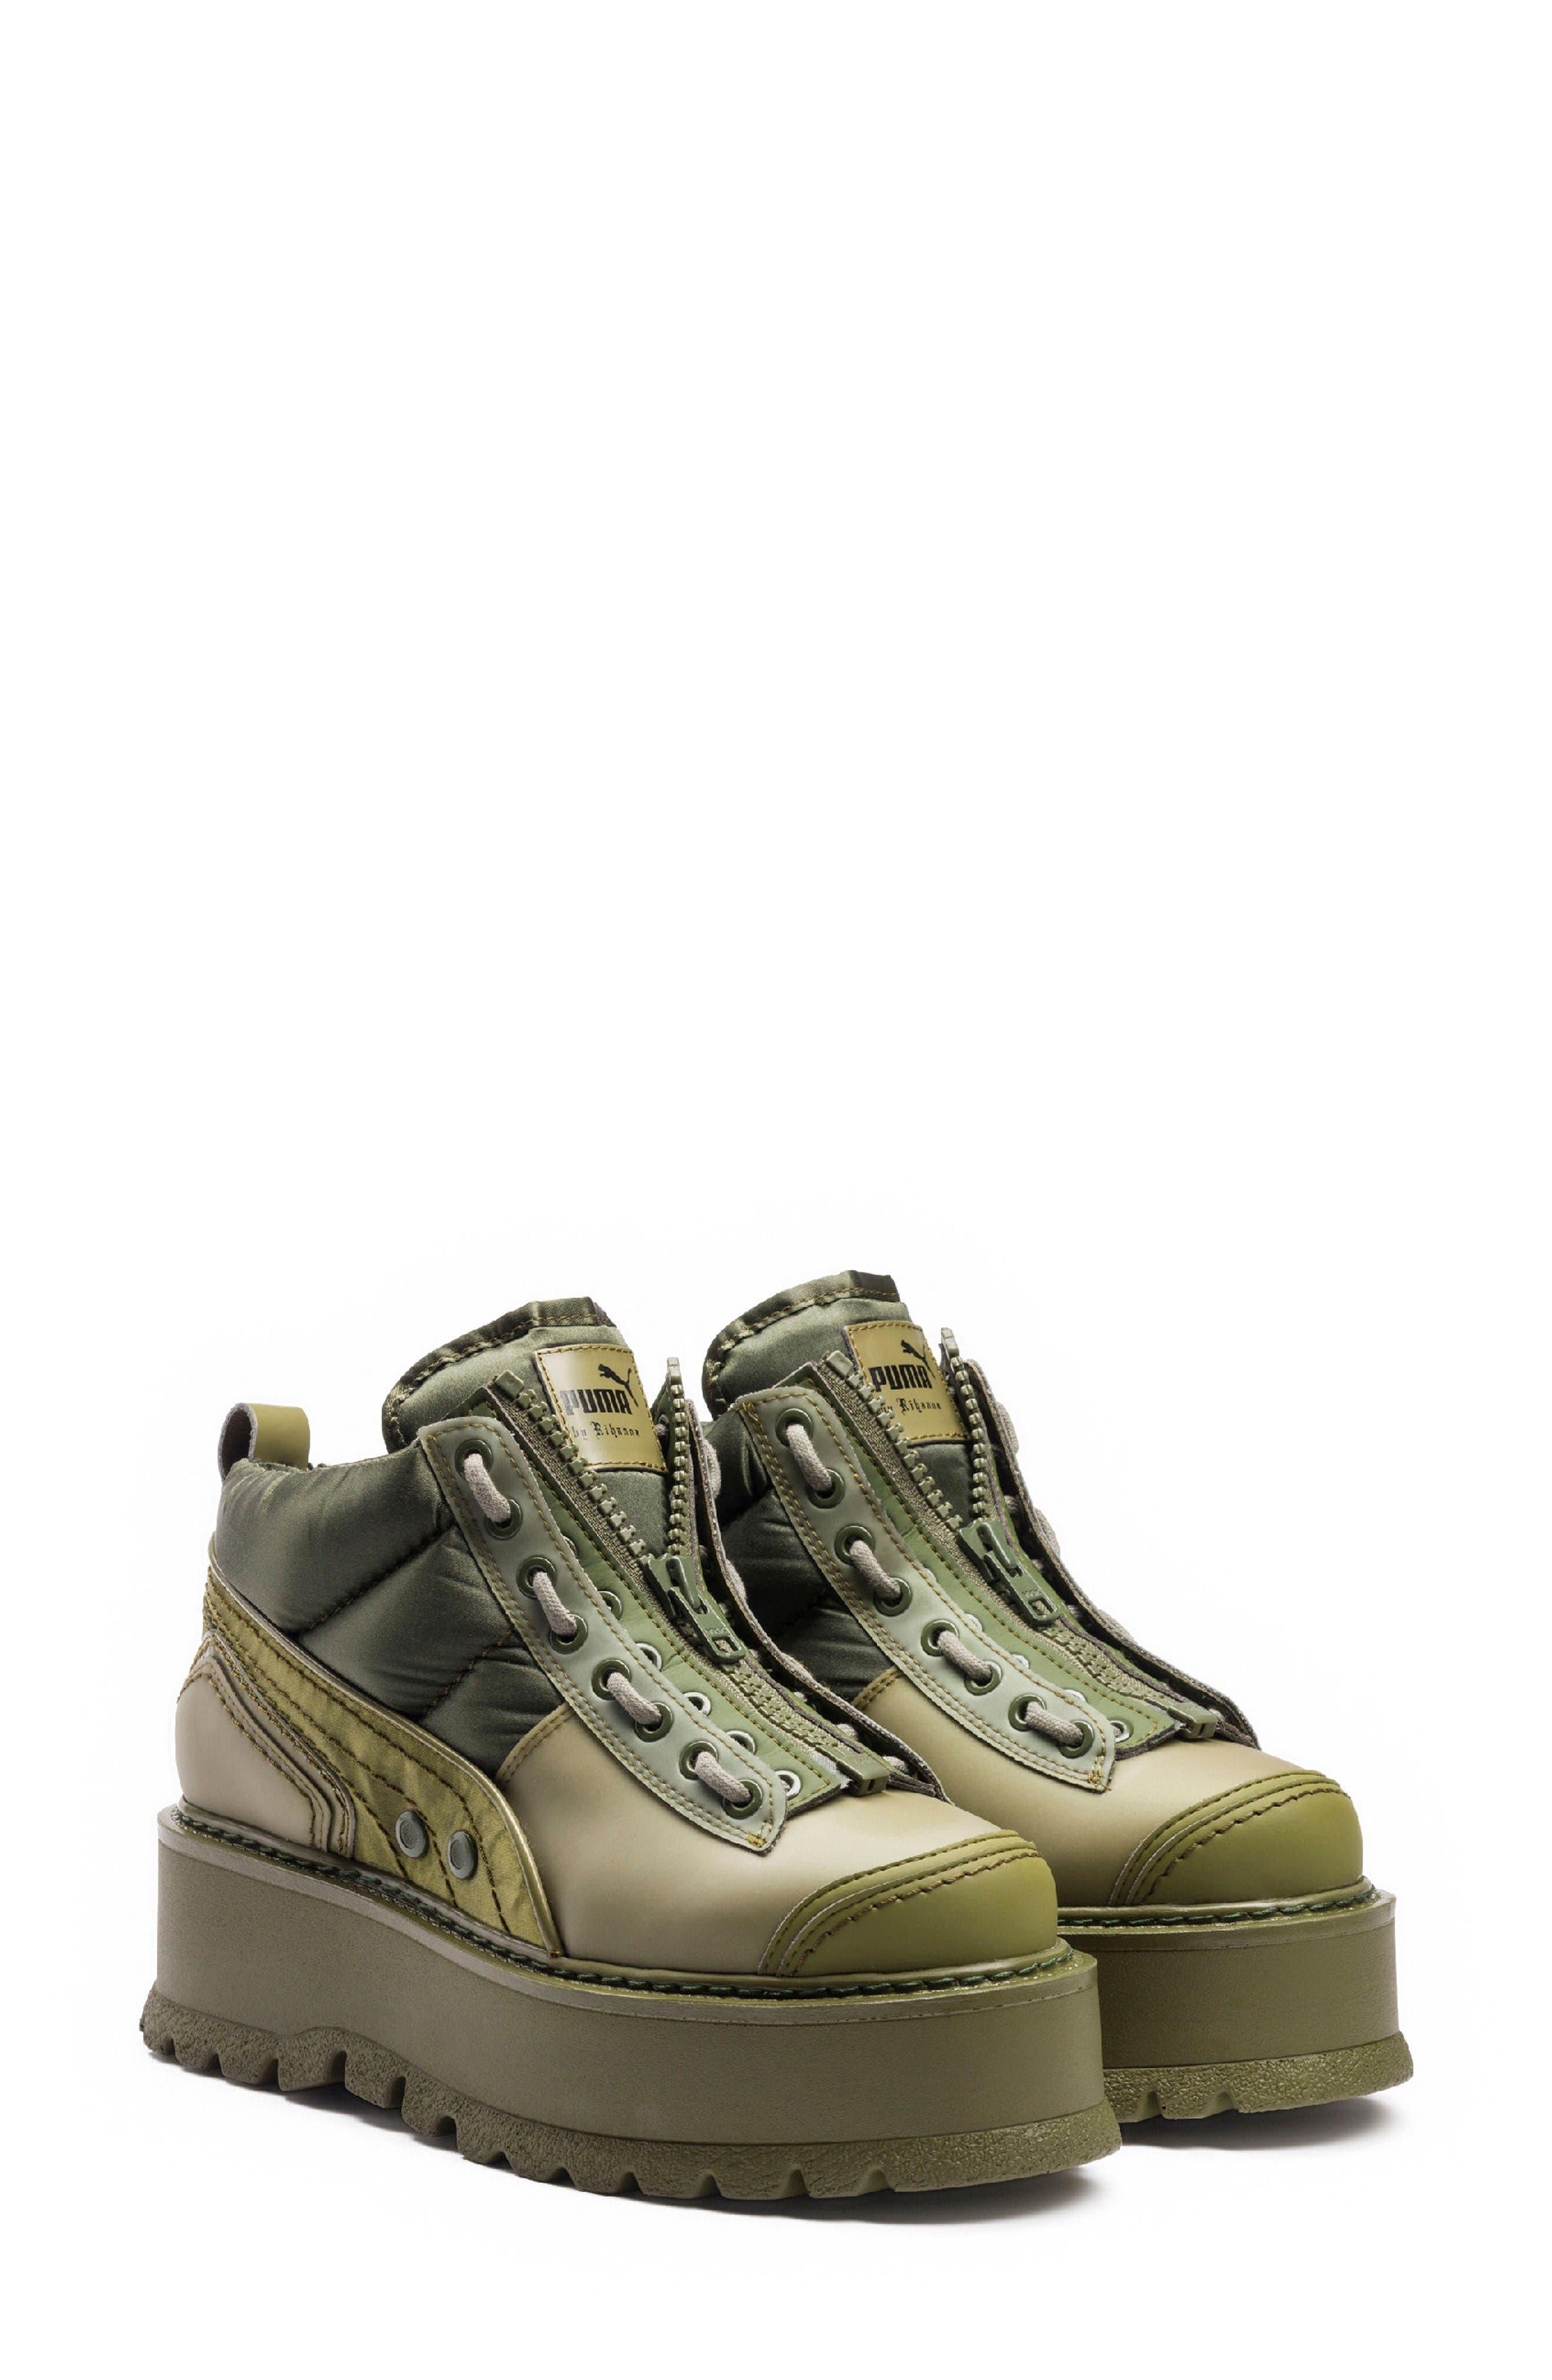 FENTY PUMA by Rihanna Platform Sneaker Boot (Women)